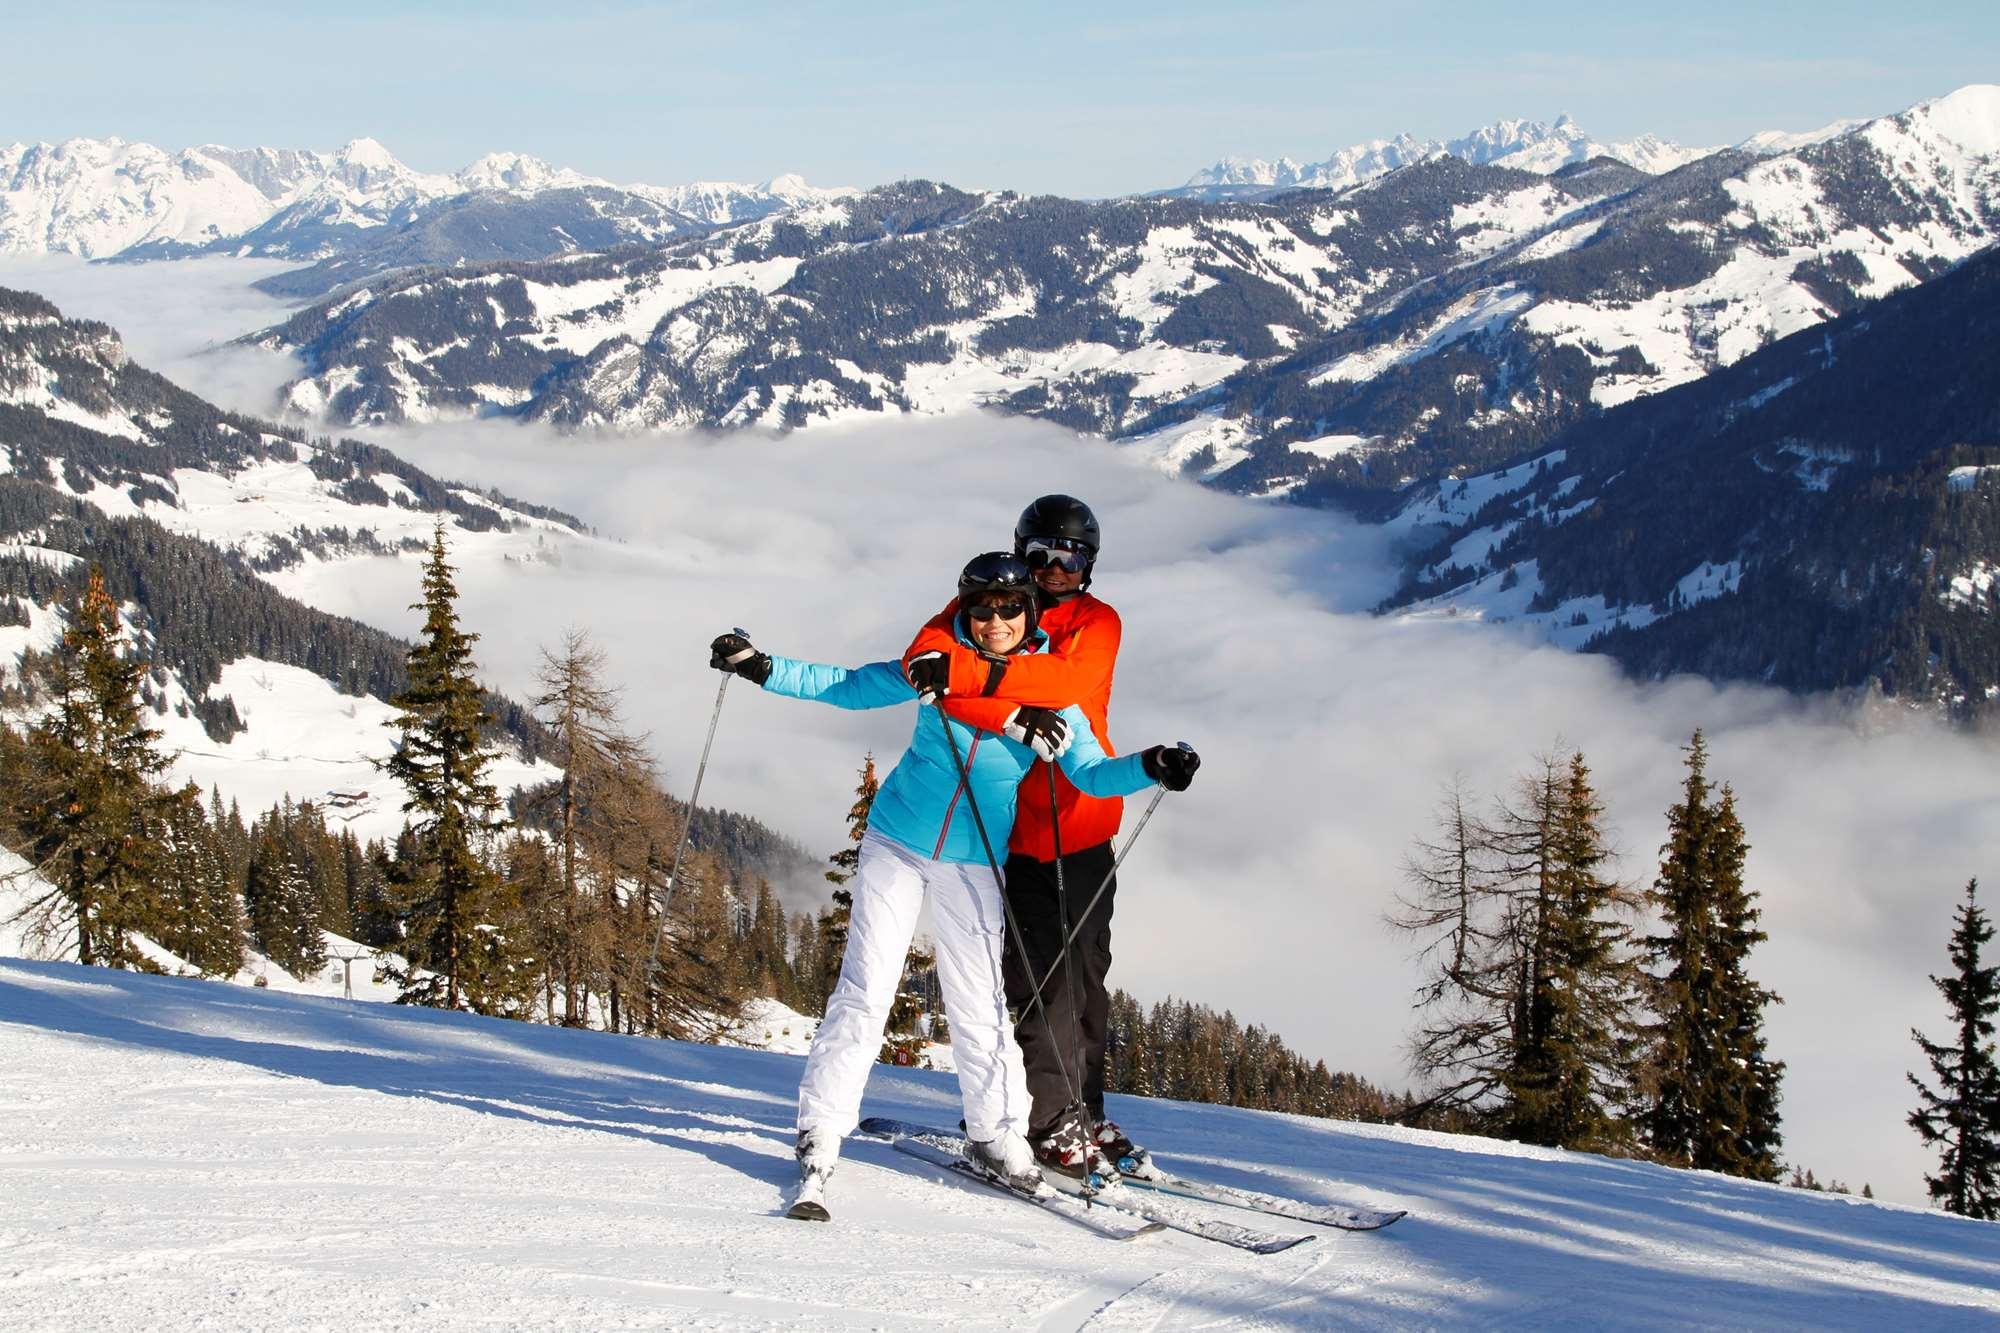 Skiing in Bad Gastein